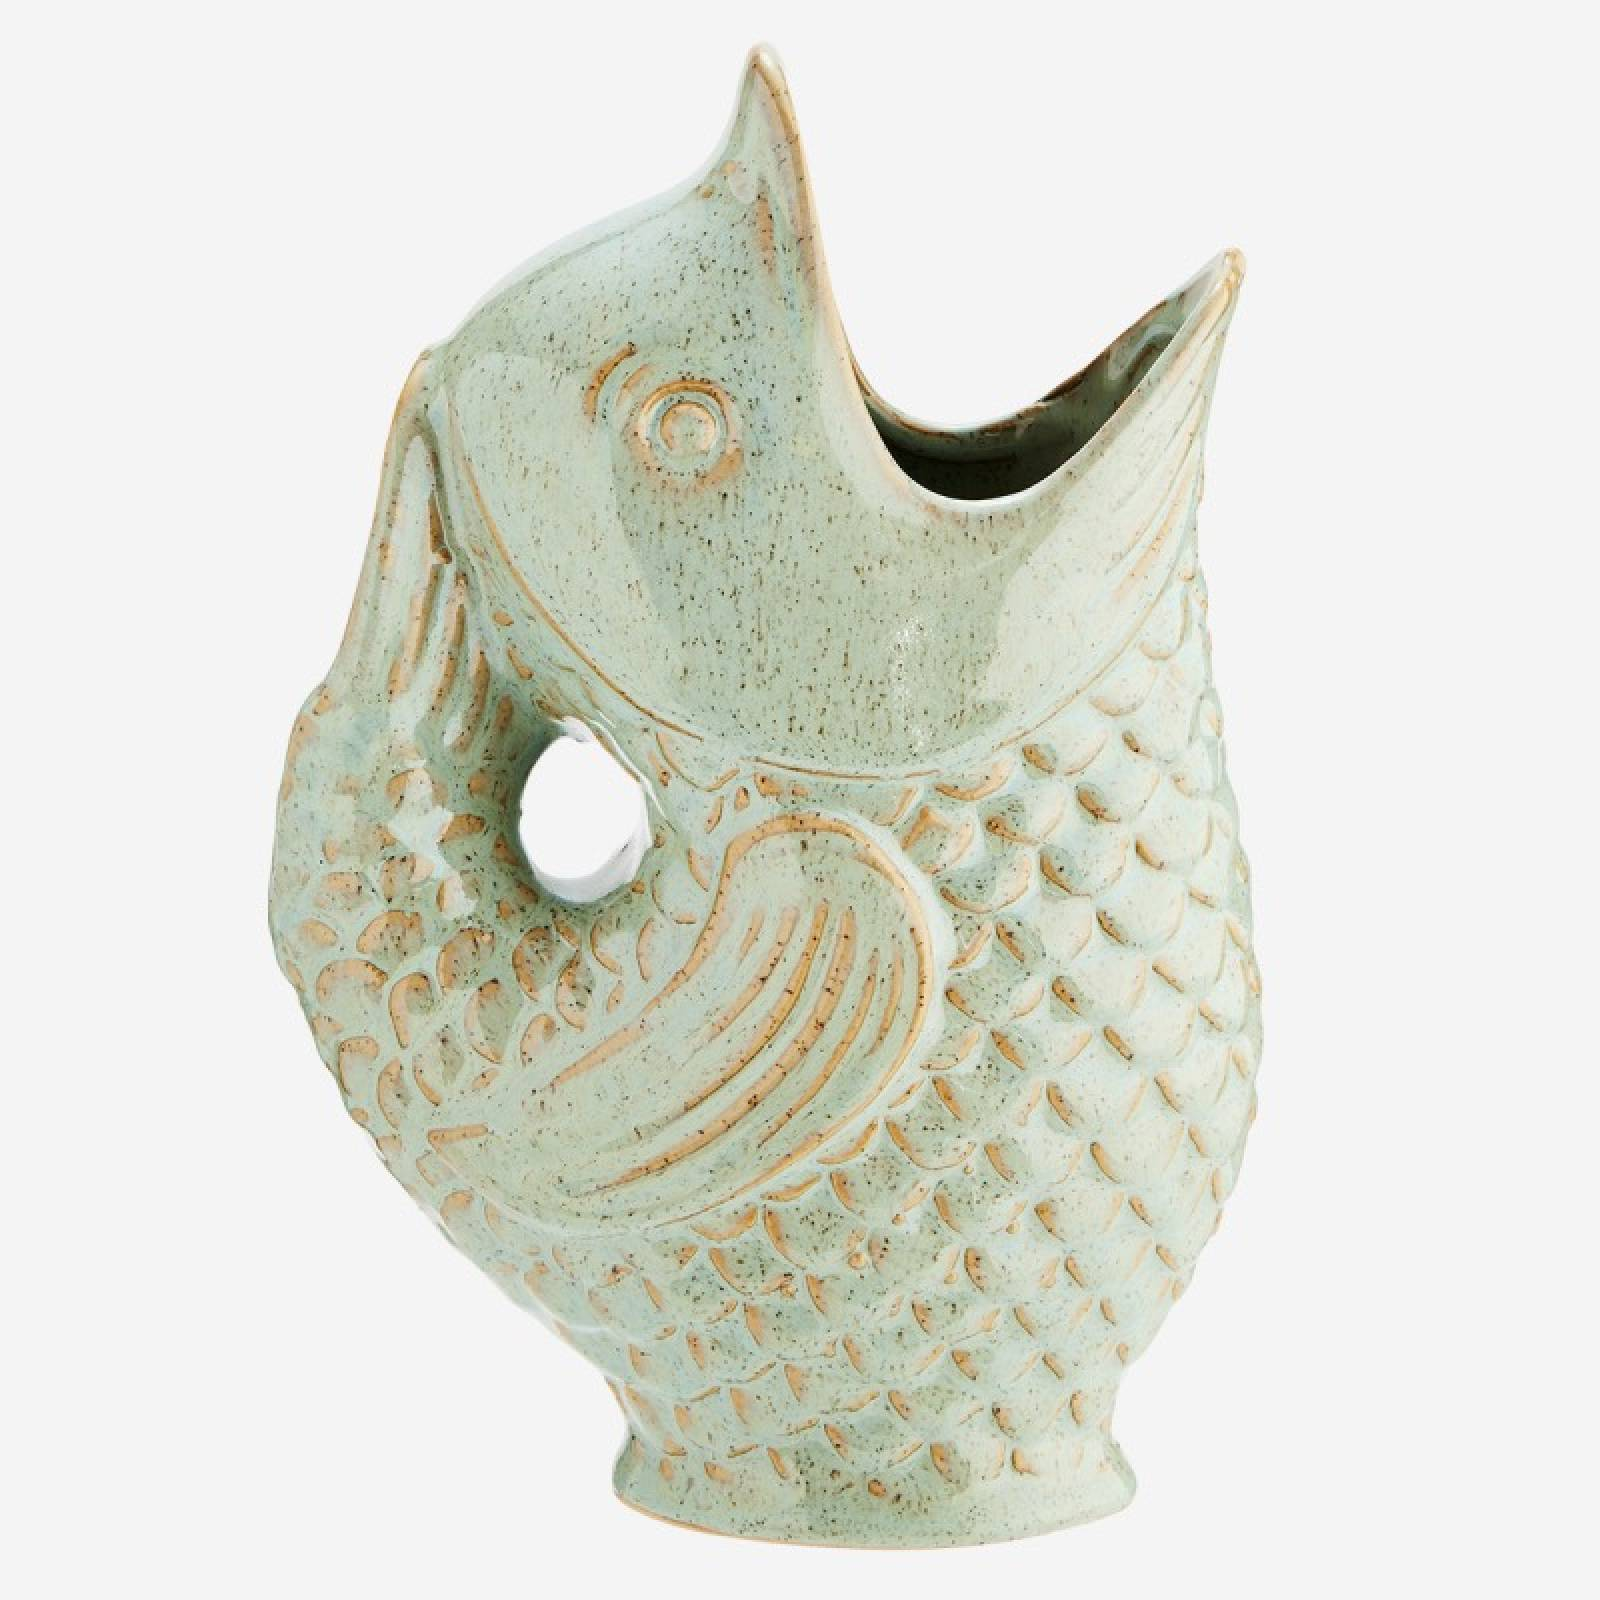 Fish Jug Vase in Sage Green Stoneware thumbnails